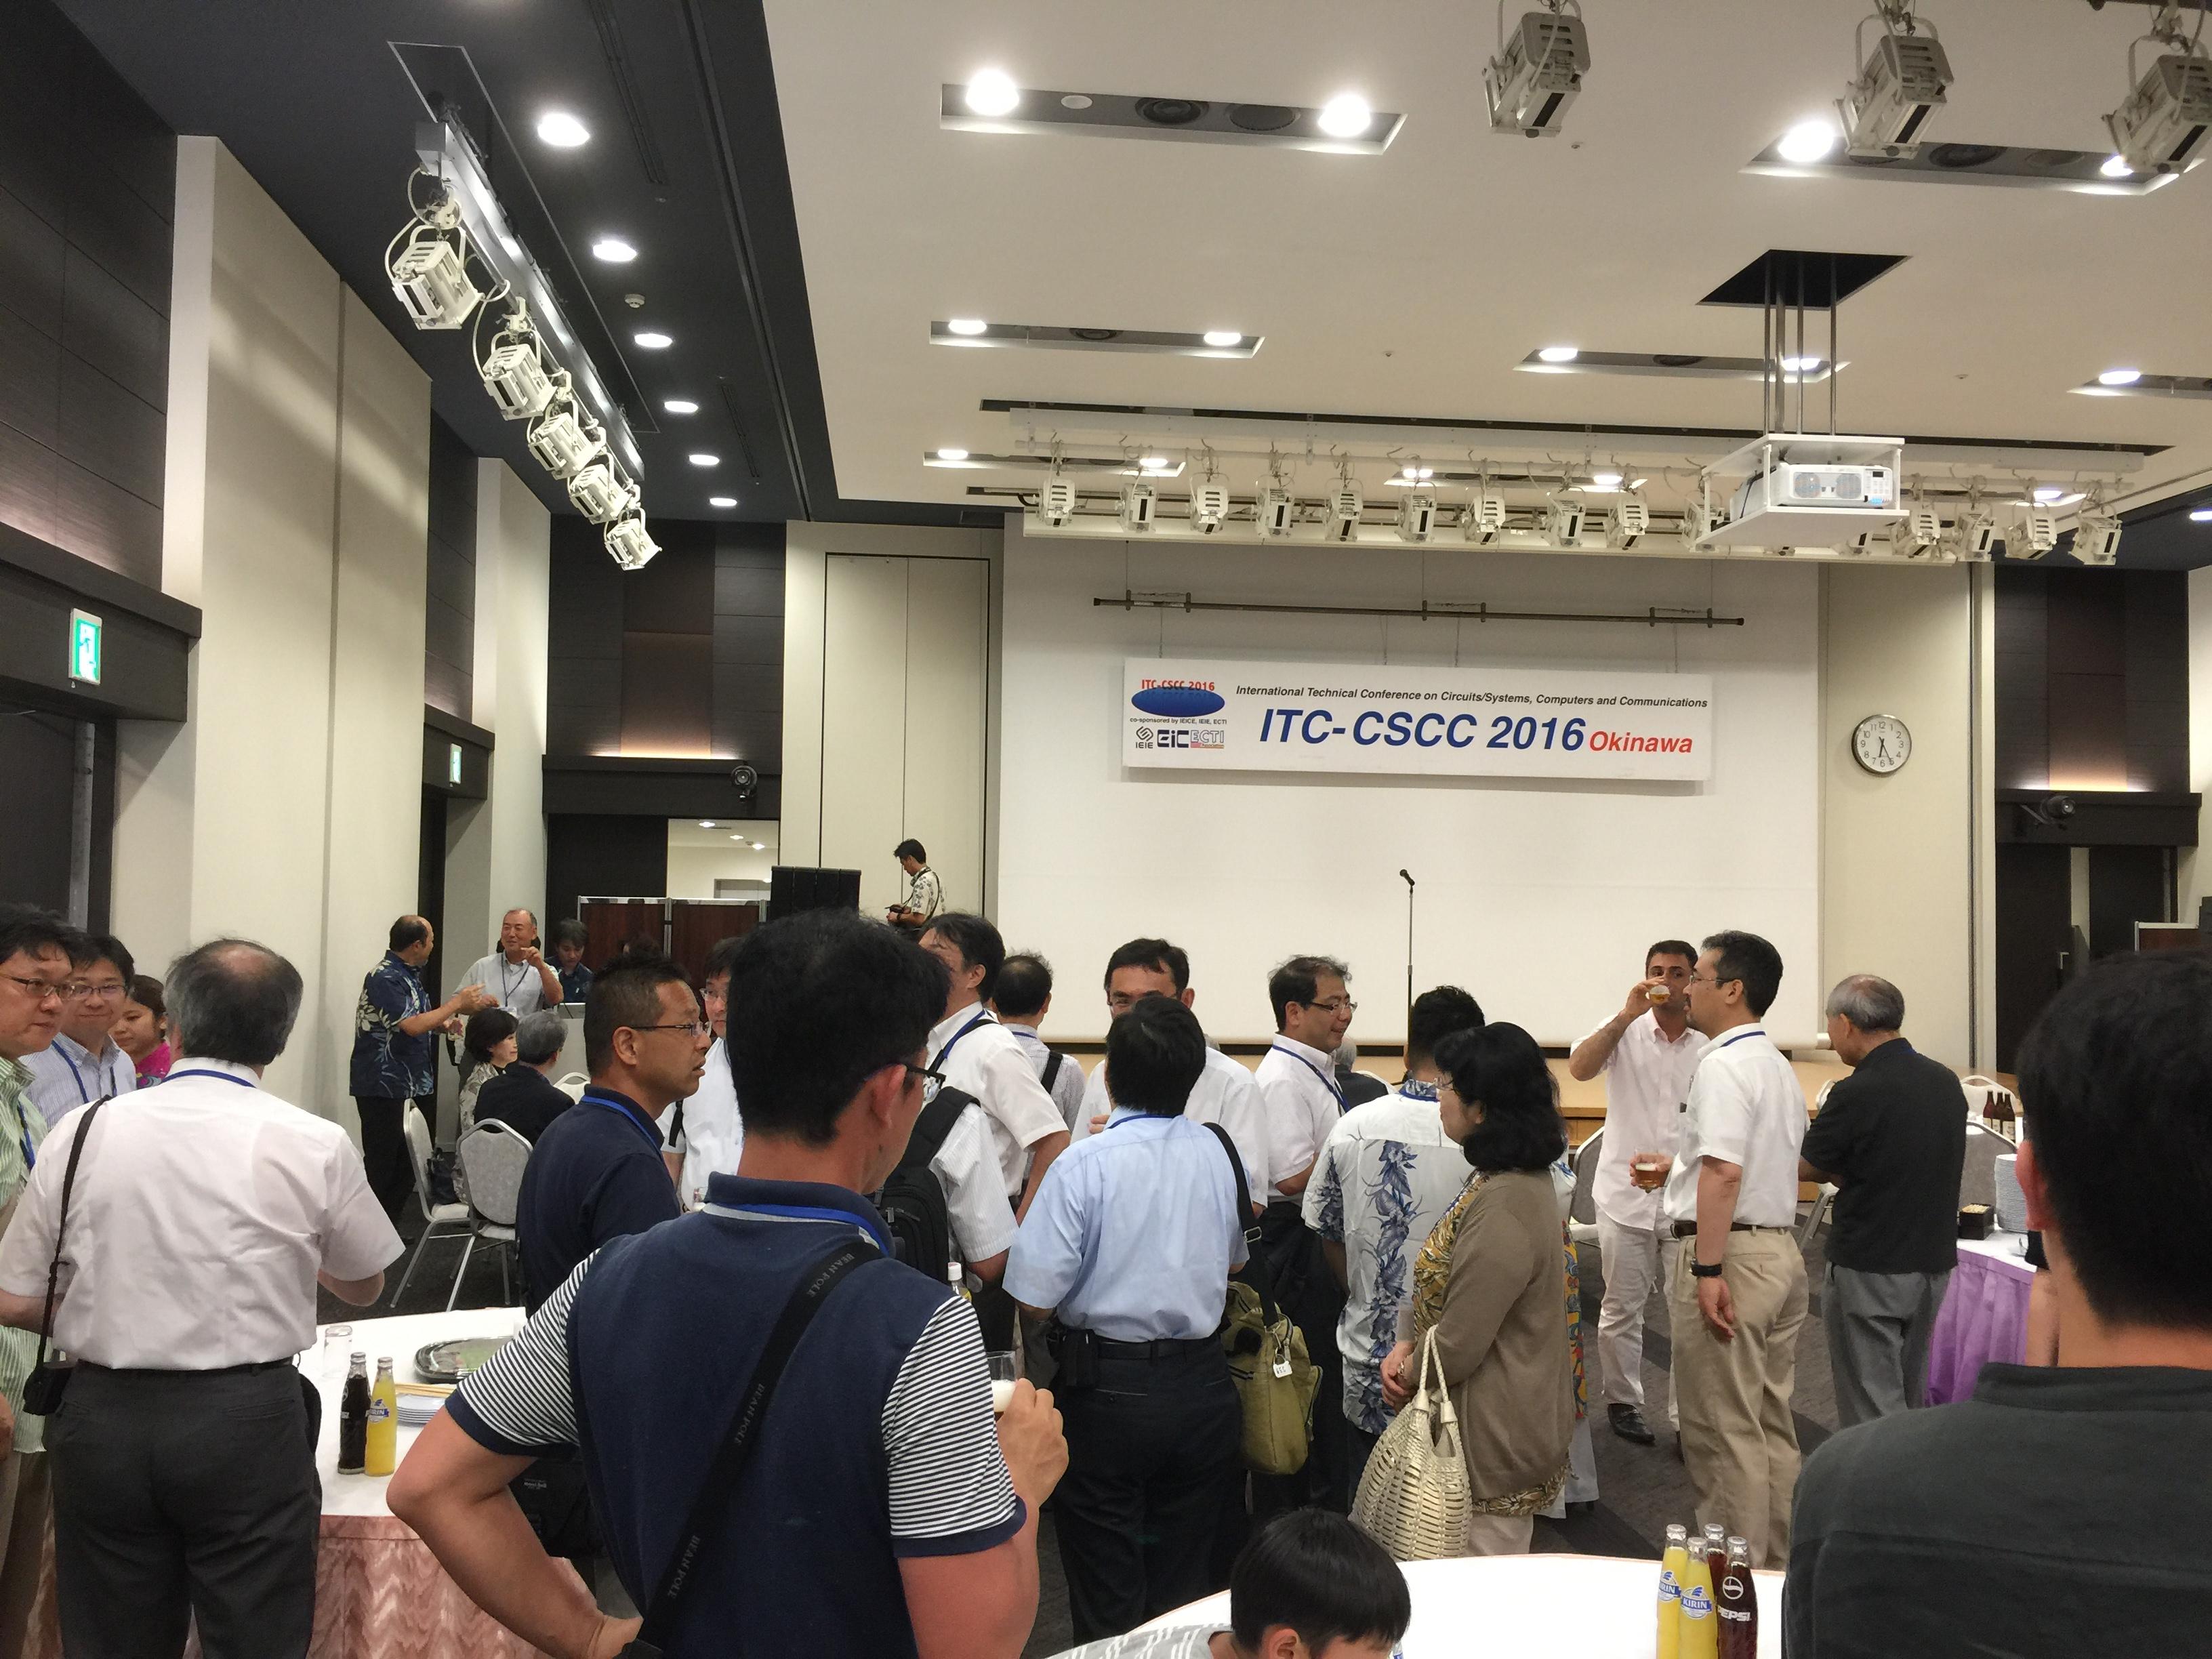 国際会議 ITC-CSCC 2016@Okinawa